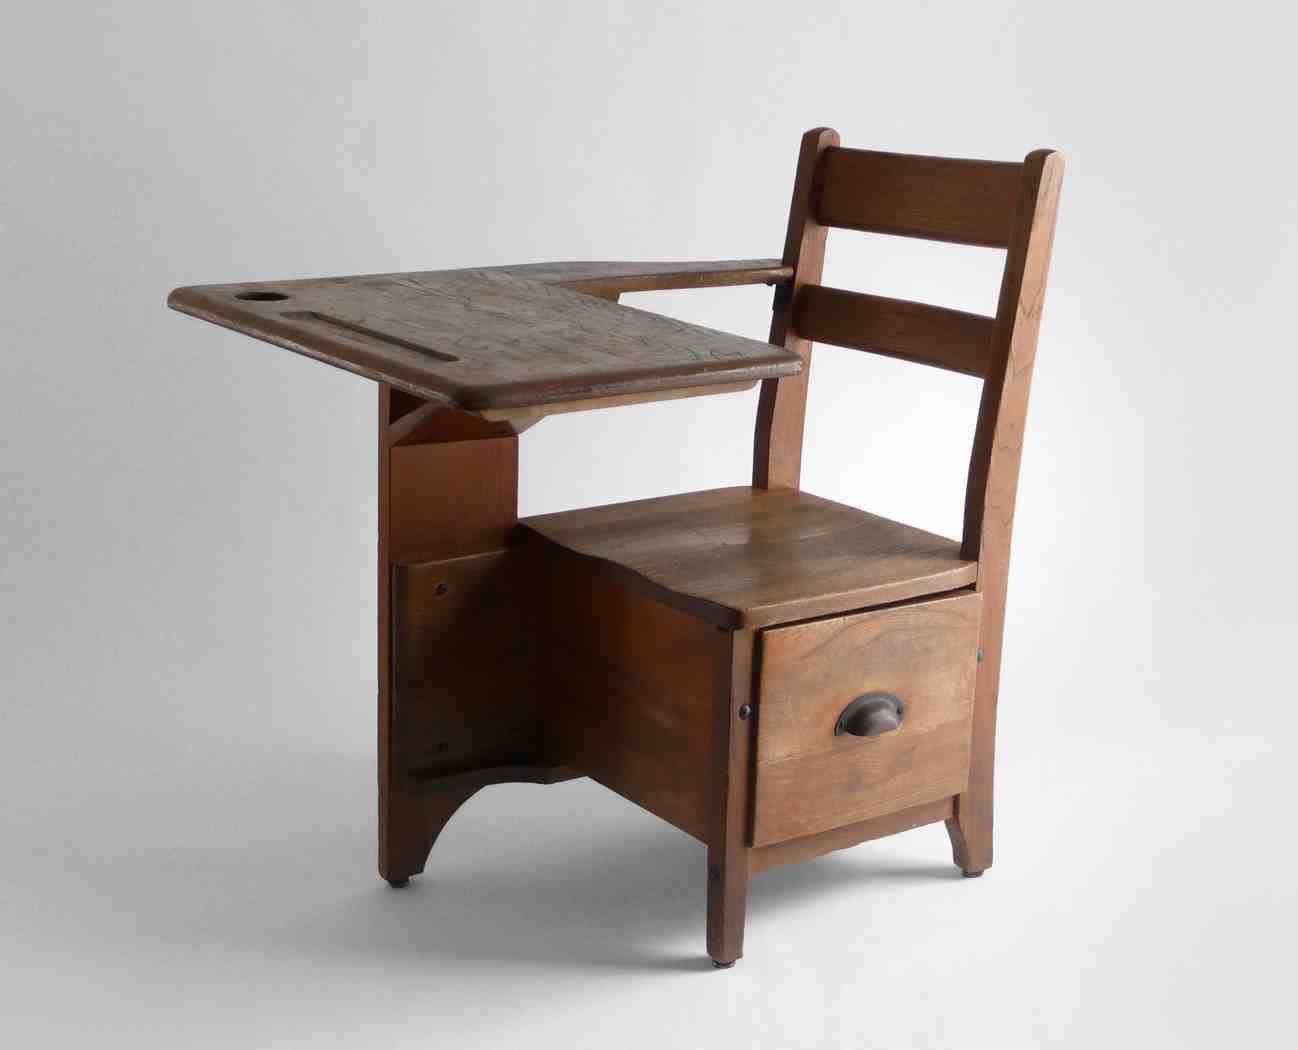 Old School Desk Value - Old School Desk Value For My Kiddos School Desks, Old School